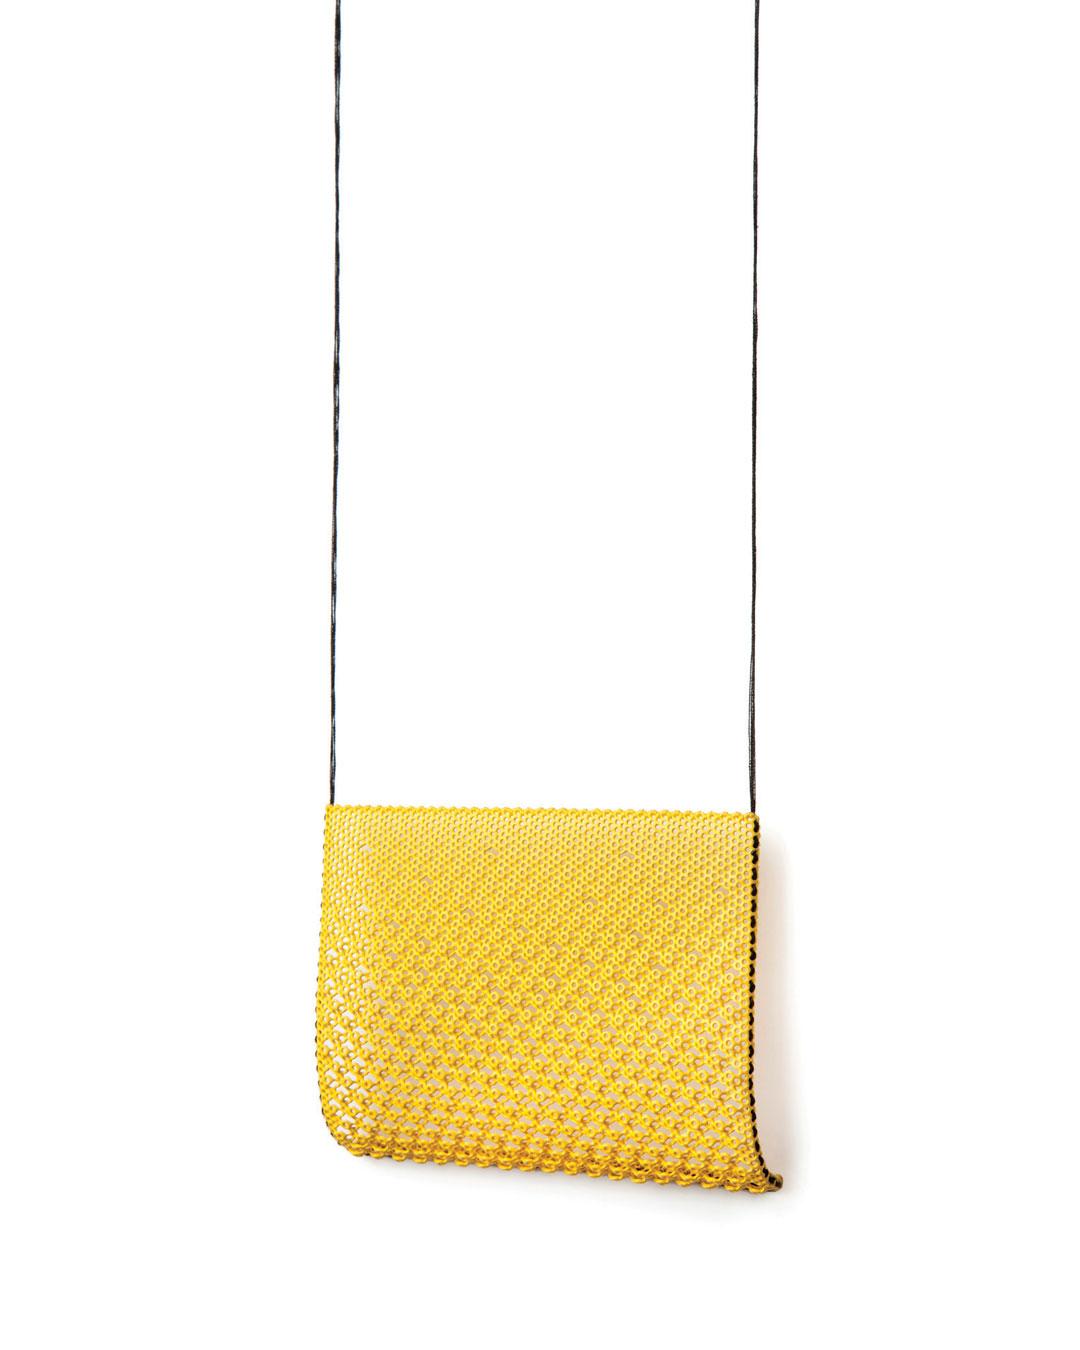 Dana Hakim, untitled, 2016, necklace; iron net, threads, paint, 275 x 100 x 15 mm, €3390